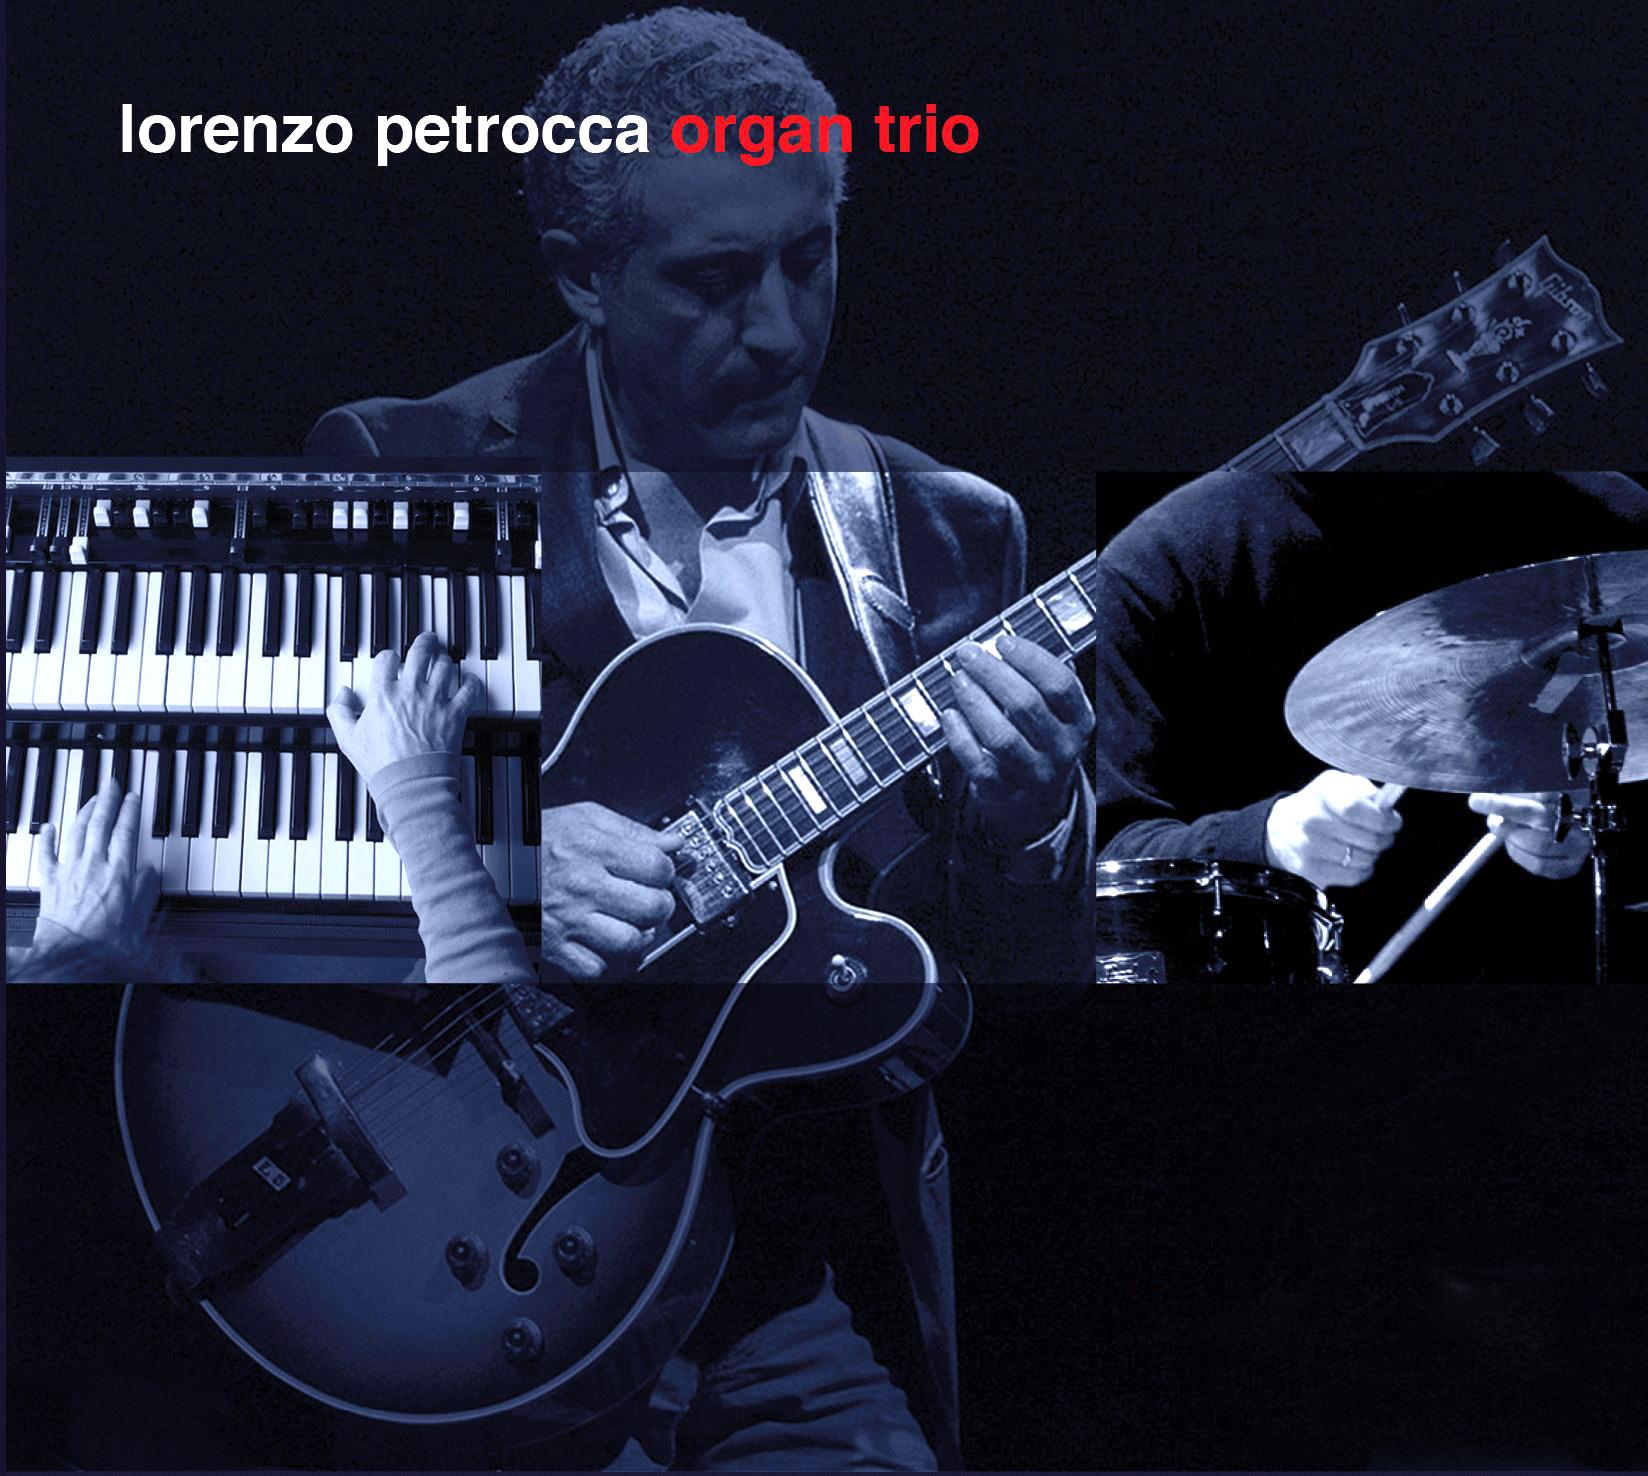 lorenzo-petrocca-organ-trio_bearbeitet-1.jpg